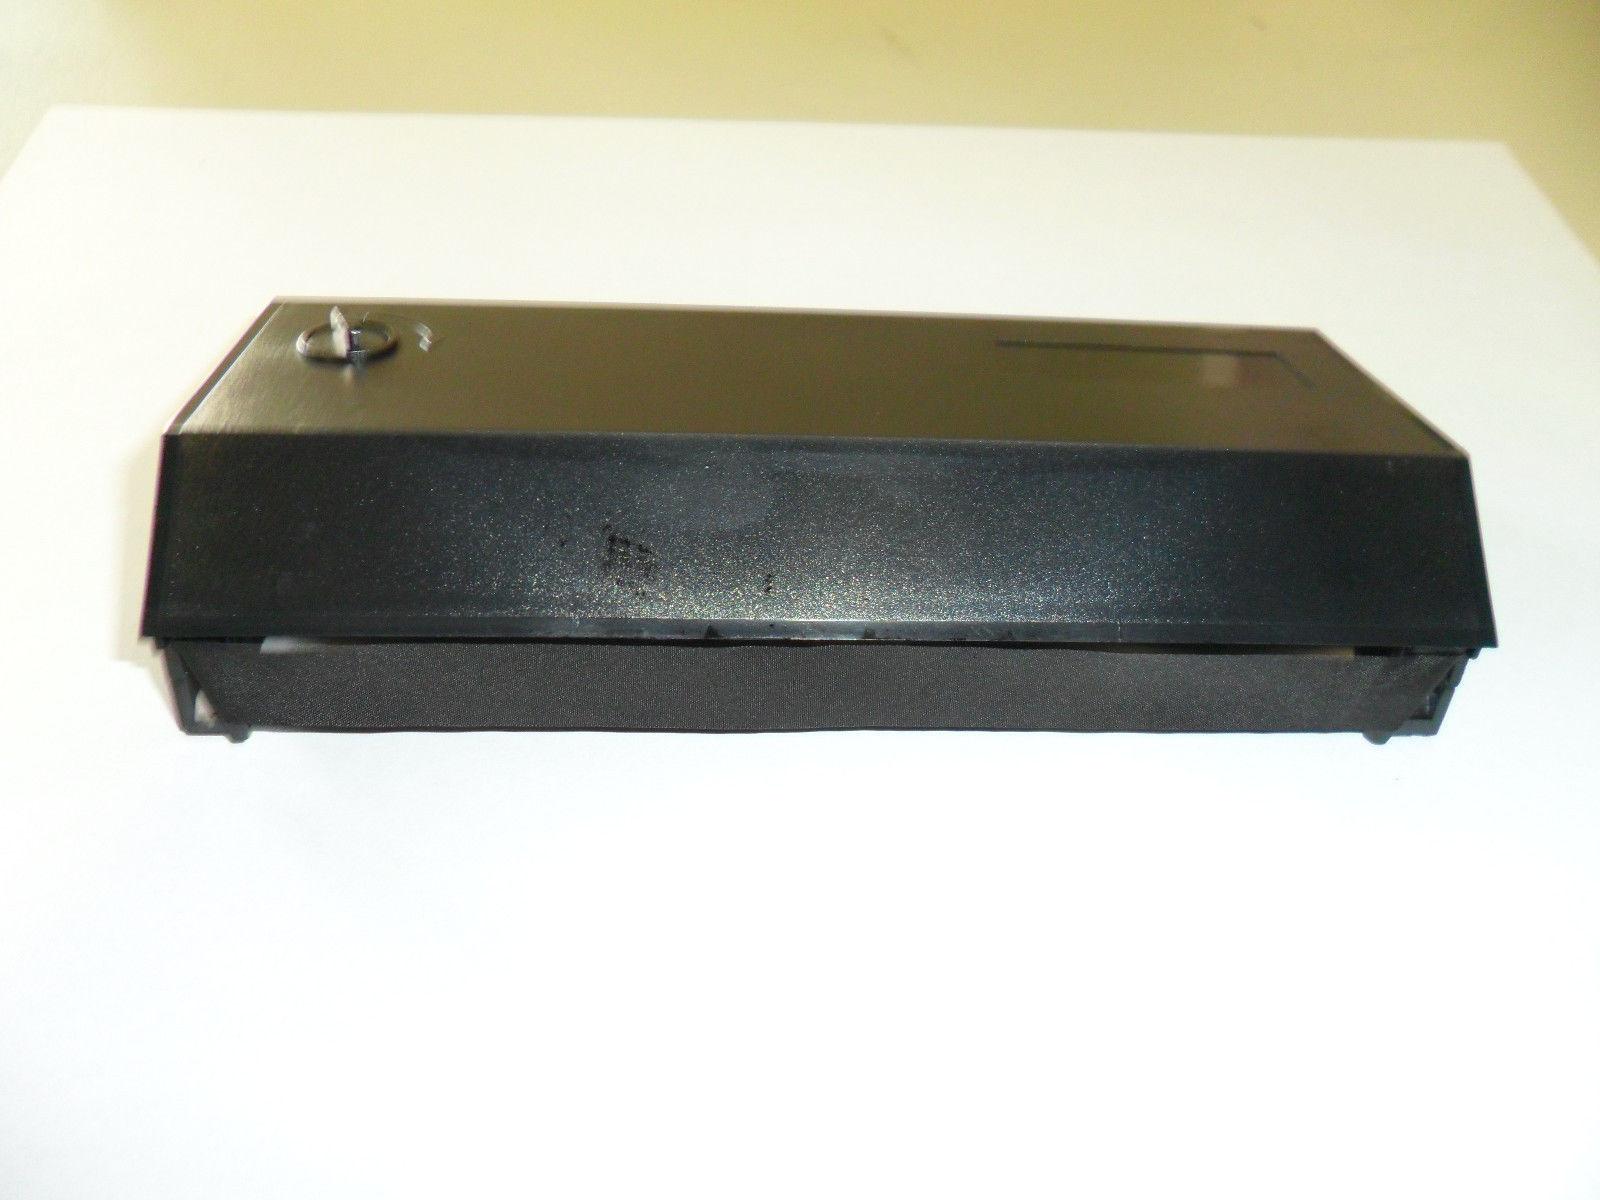 Toledo 5000 8800 8806 Scale Ribbon Purple Compatible (2 Pack)